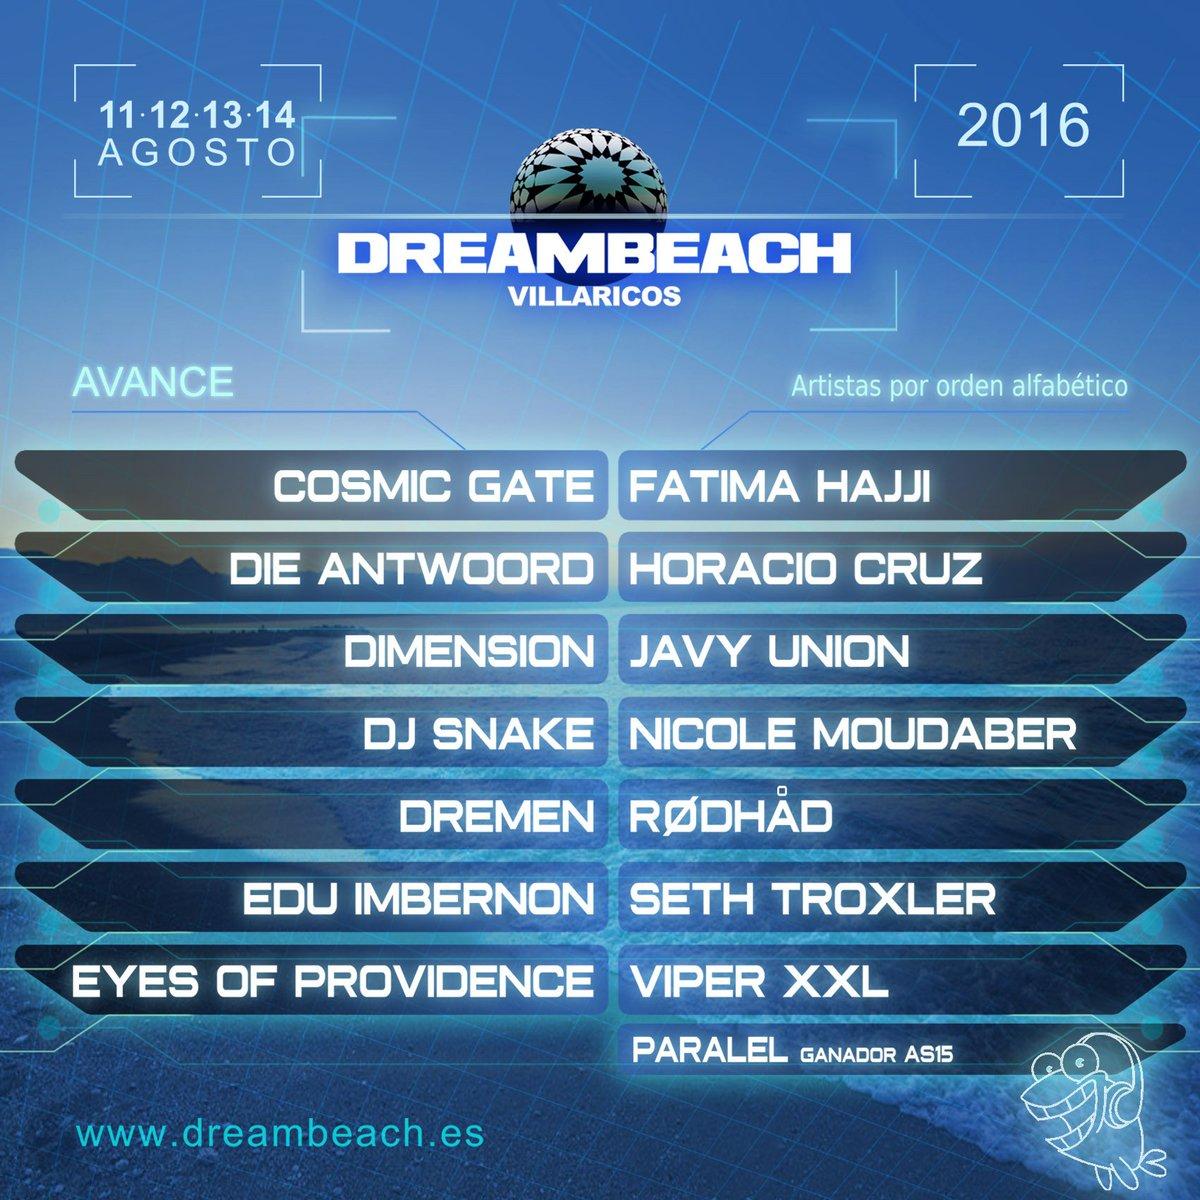 #Dreambeach CONFIRMAMOS que este verano vas a vivir algo ÚNICO: #GoVillaricos #SoyDreamer